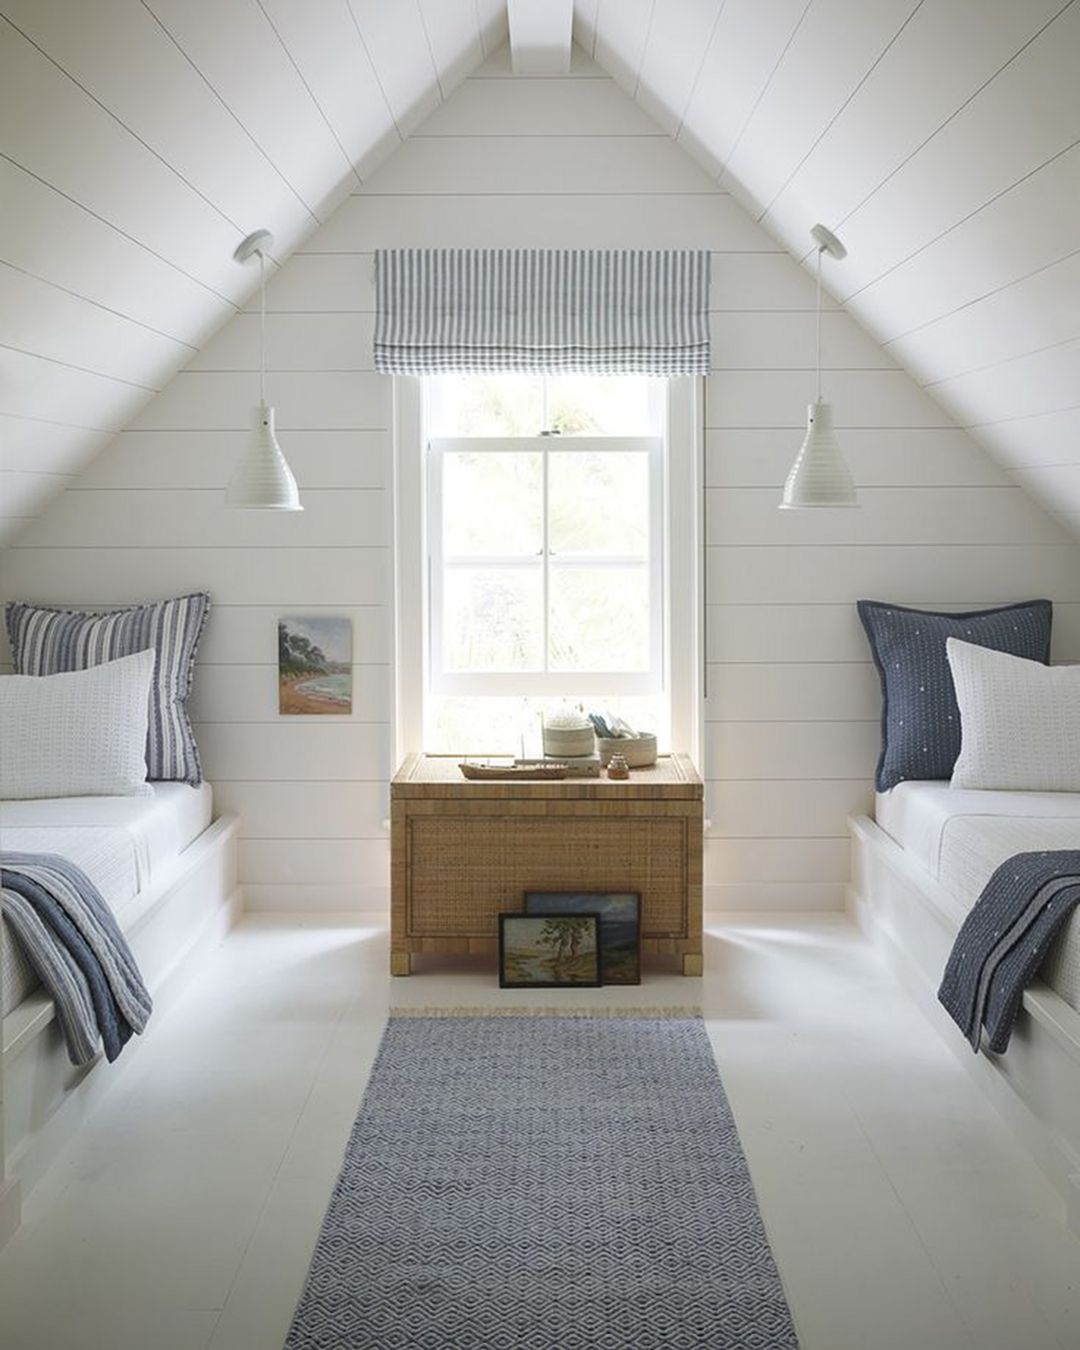 Awesome 15 Home Farmhouse Decorating Ideas